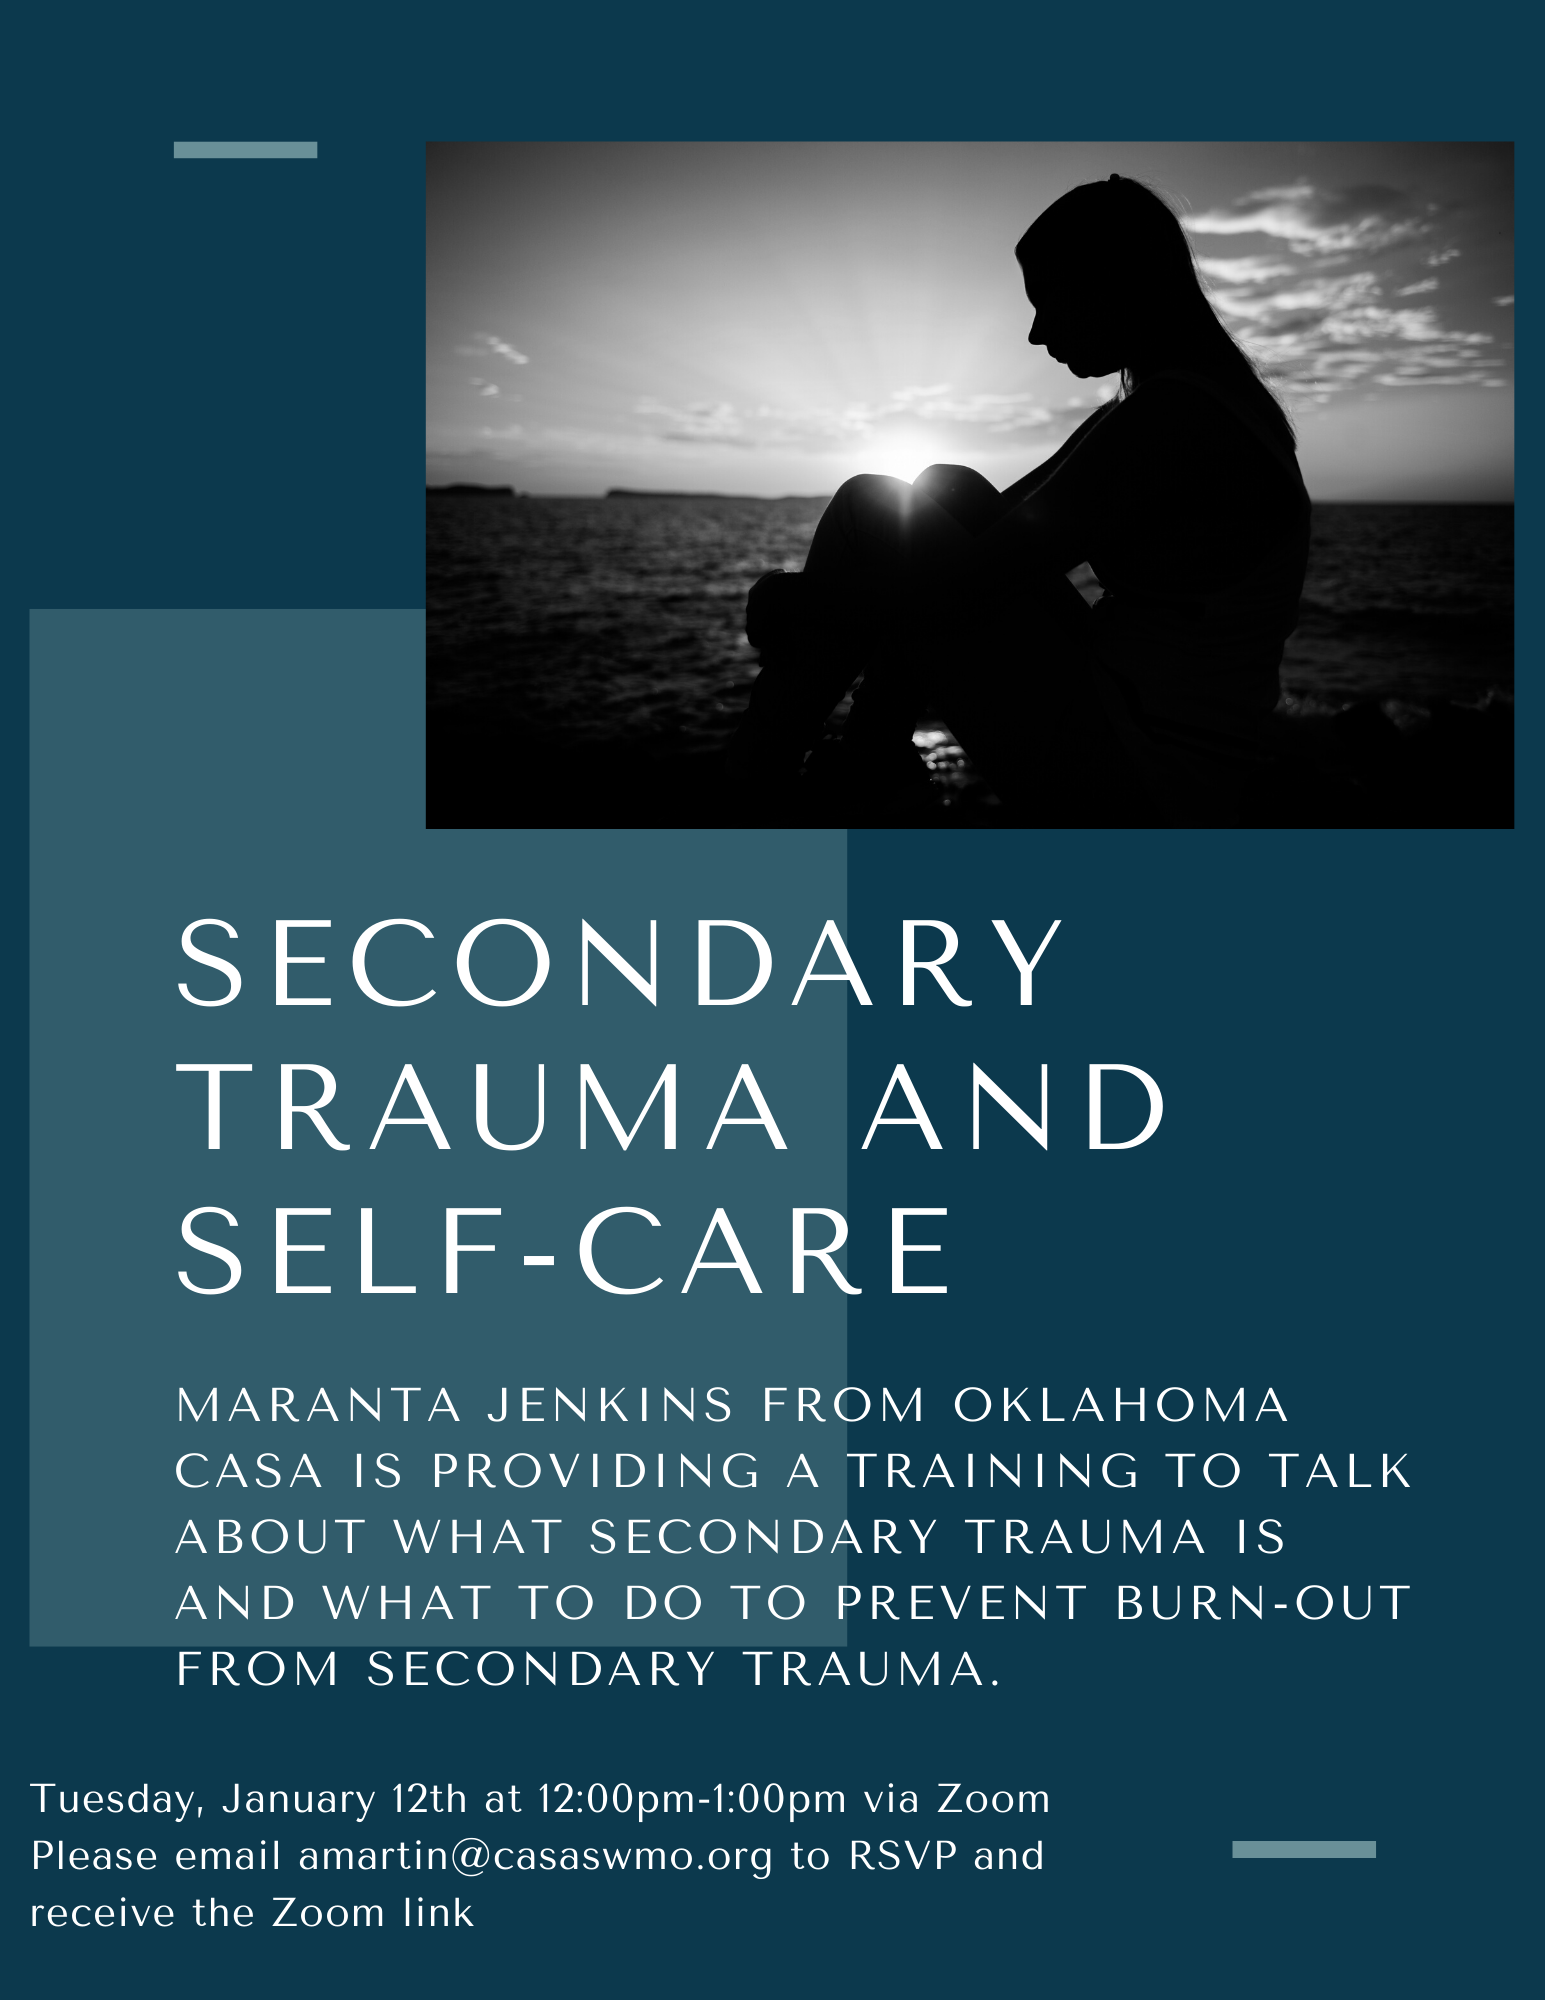 Secondary Trauma and Self-Care